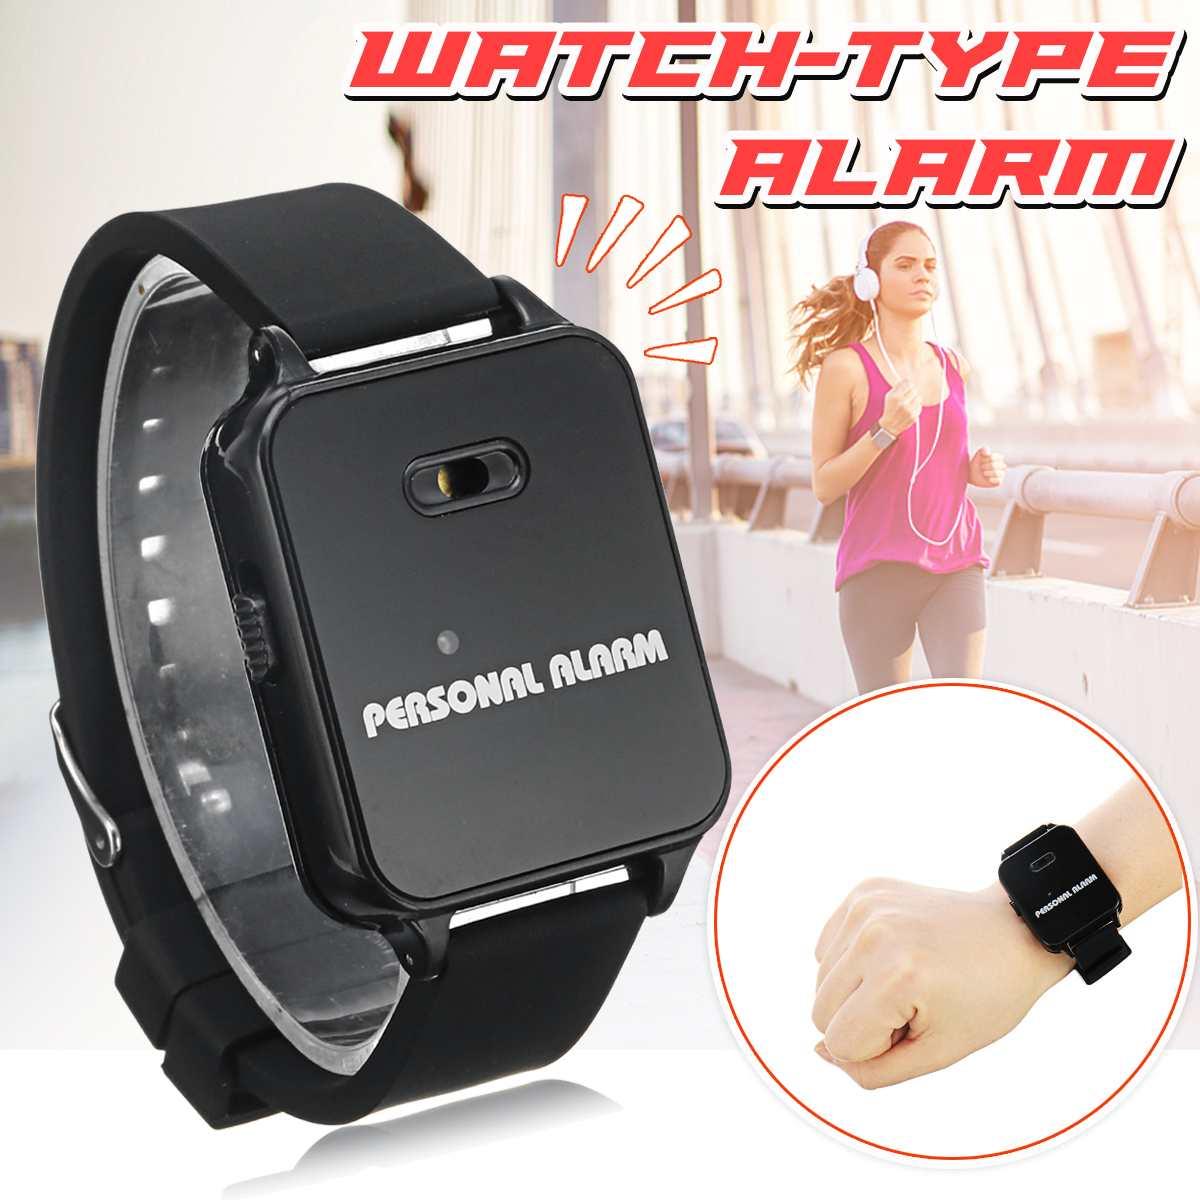 120dB Sound Portable Alarm Watch ABS Sport Digital Personal Security Alarm Watch For Men Women The Elderly Children